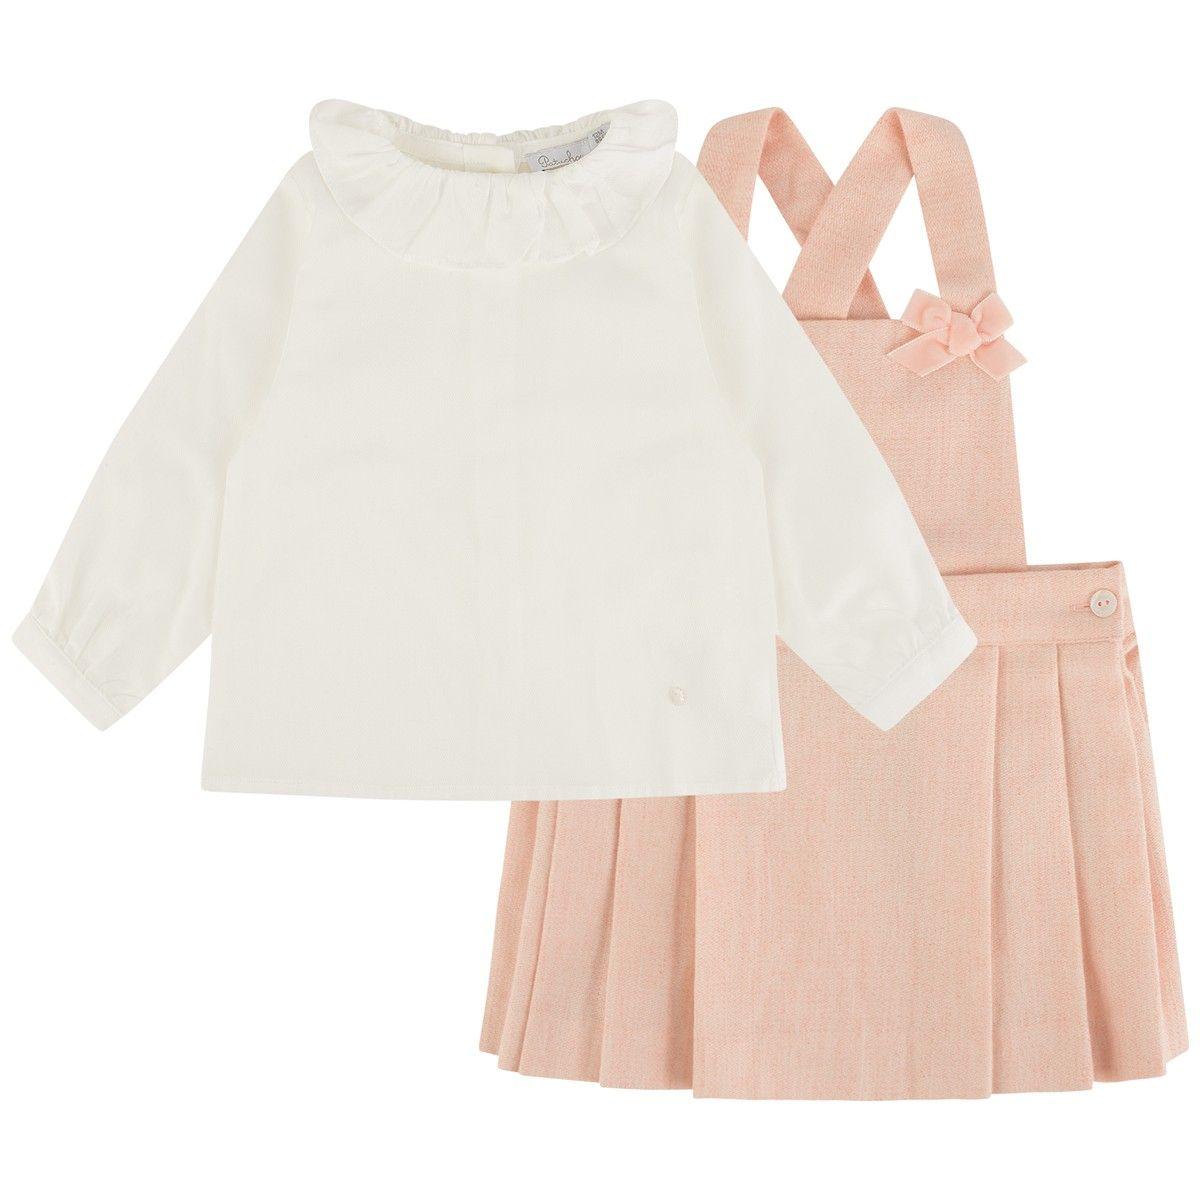 831135b181 Patachou Baby Girls Blouse & Pinafore Skirt Set | Baby and Boujee ...